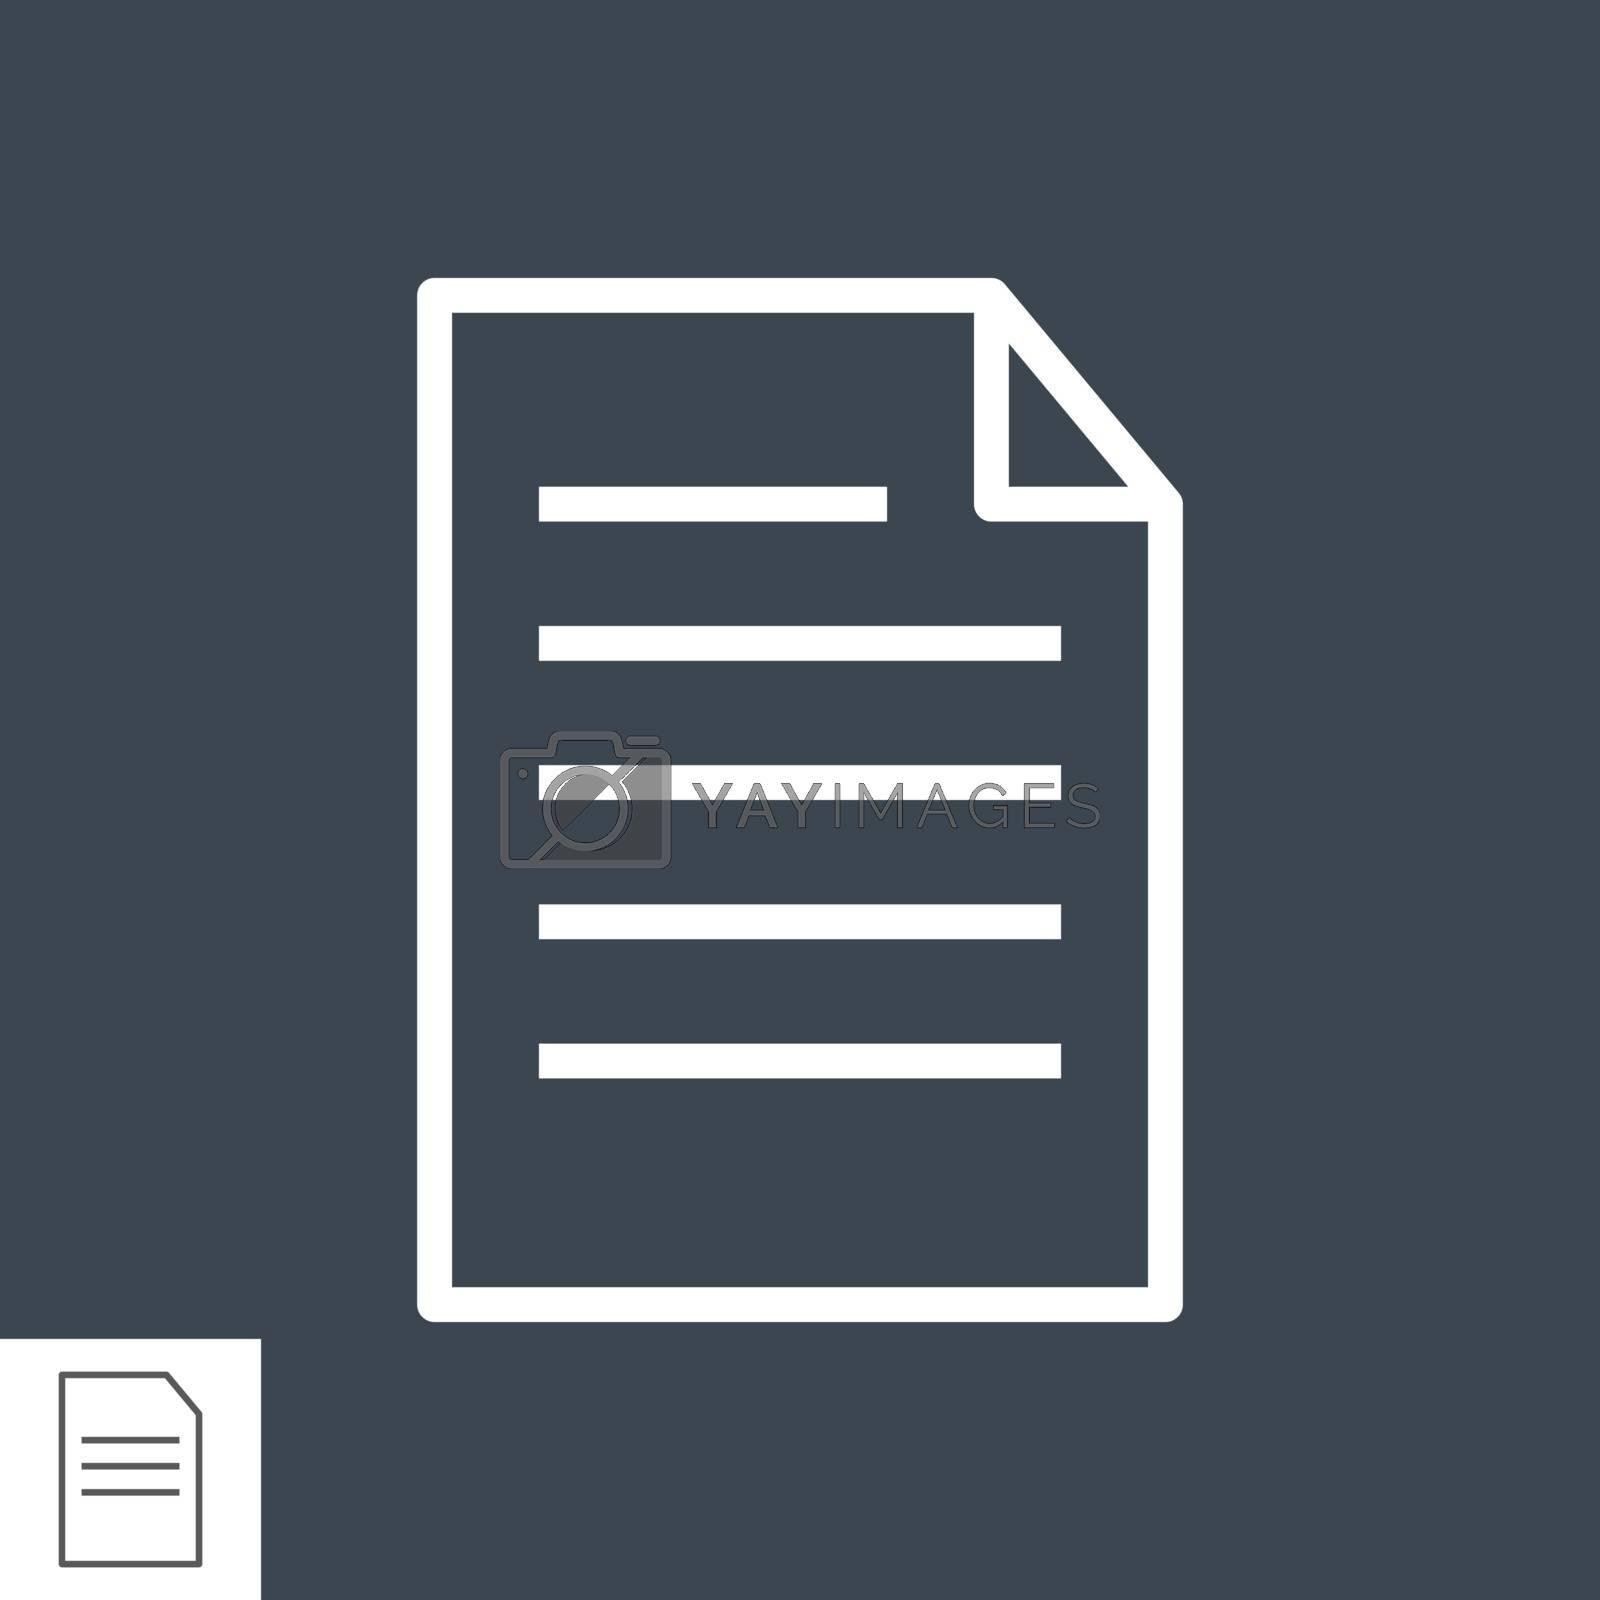 Paper line icon by smoki